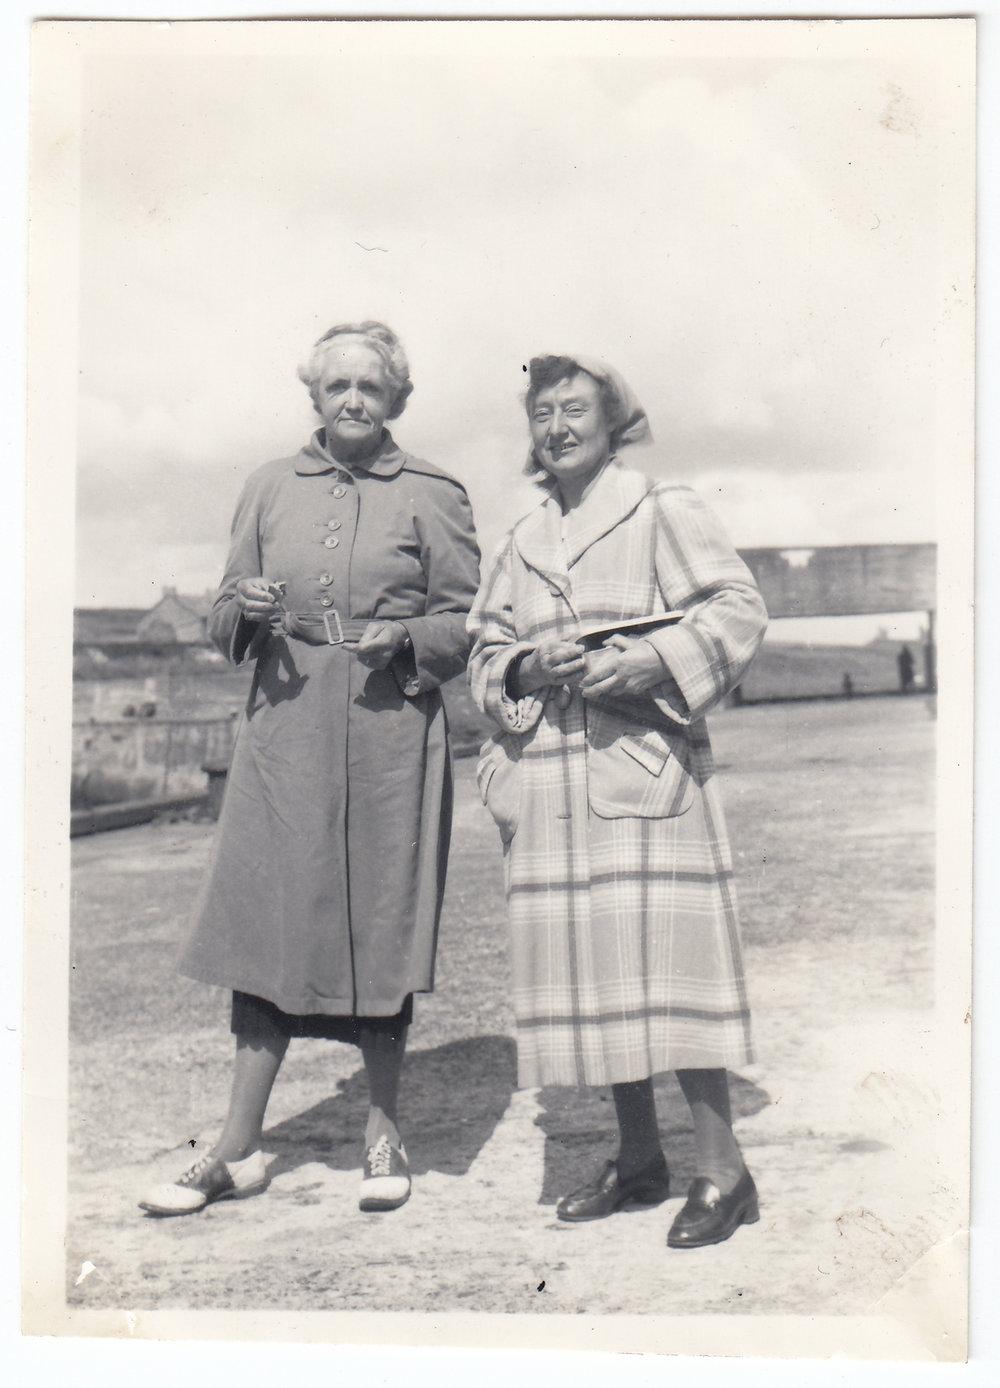 MED - Gwen & Hilda, Northumberland, August 1953